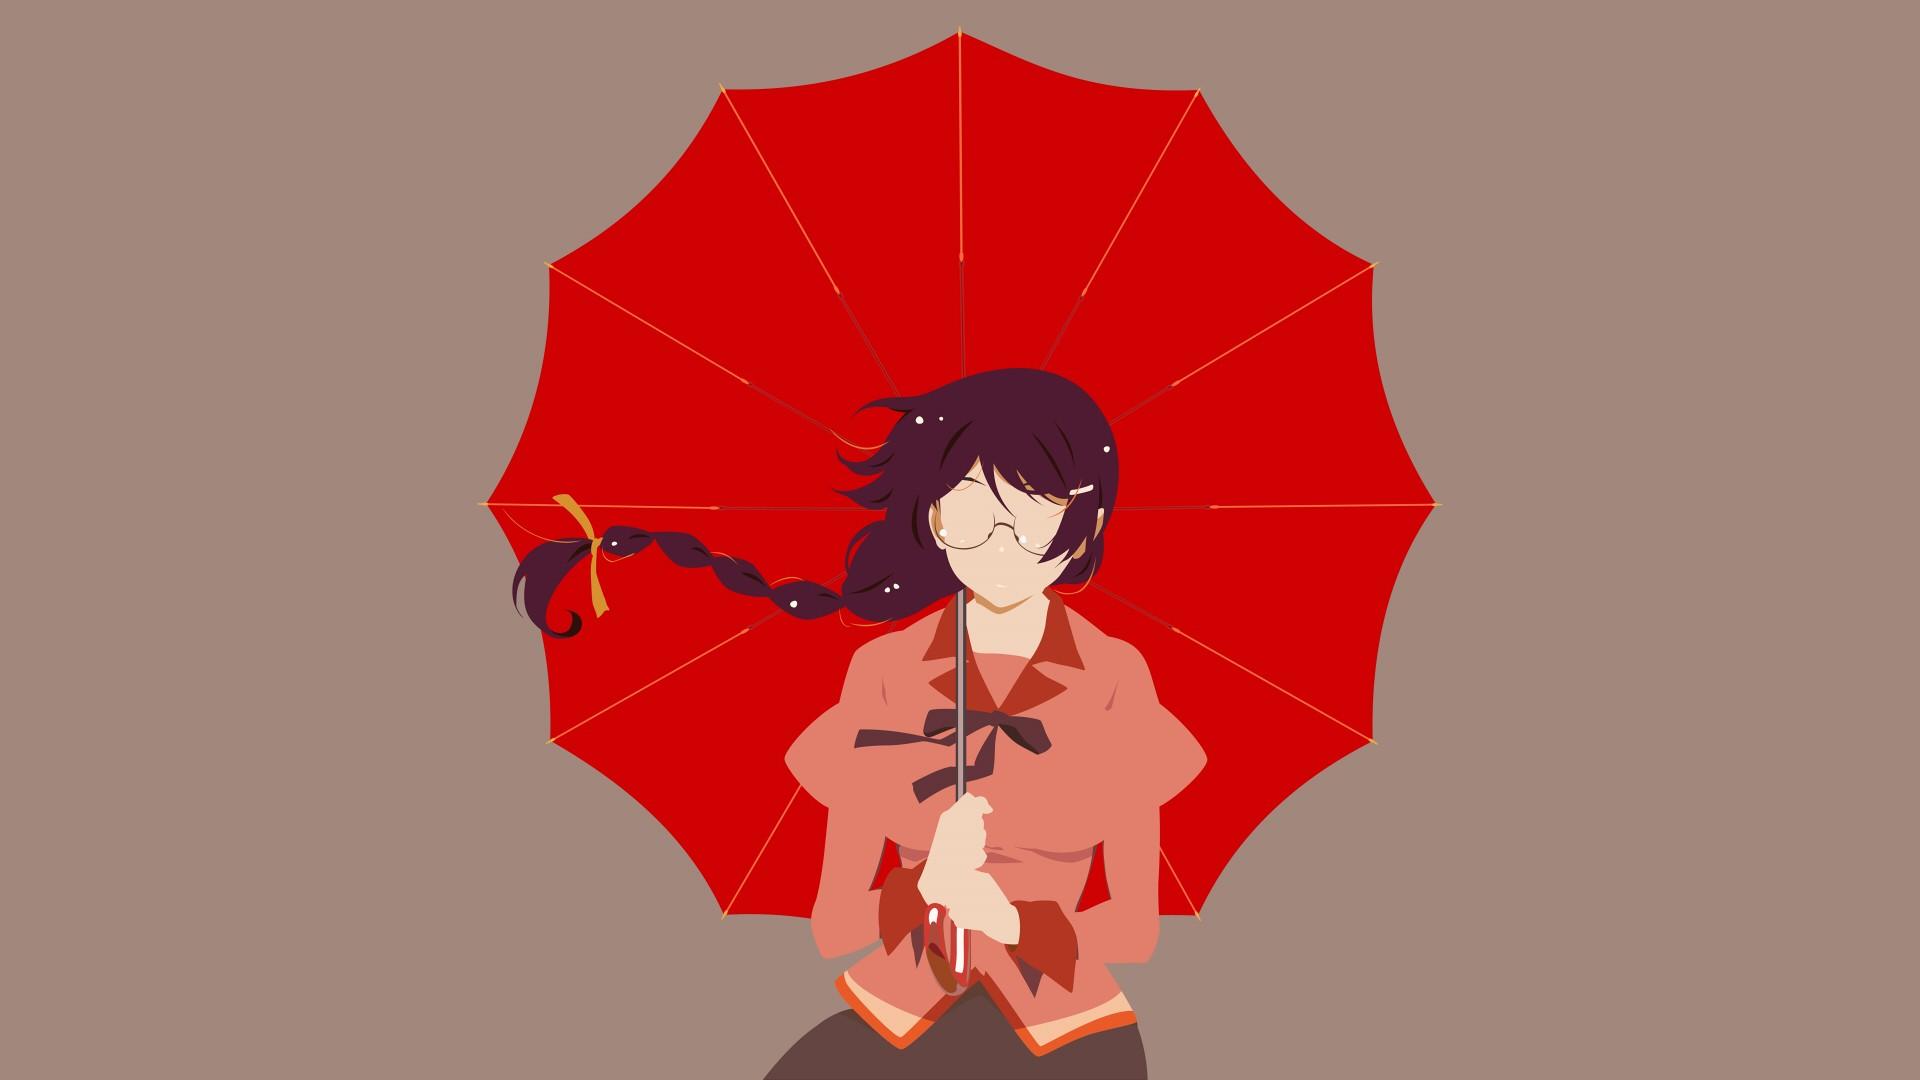 Wallpaper Tsubasa Hanekawa, Bakemonogatari, with red umbrella, anime girl